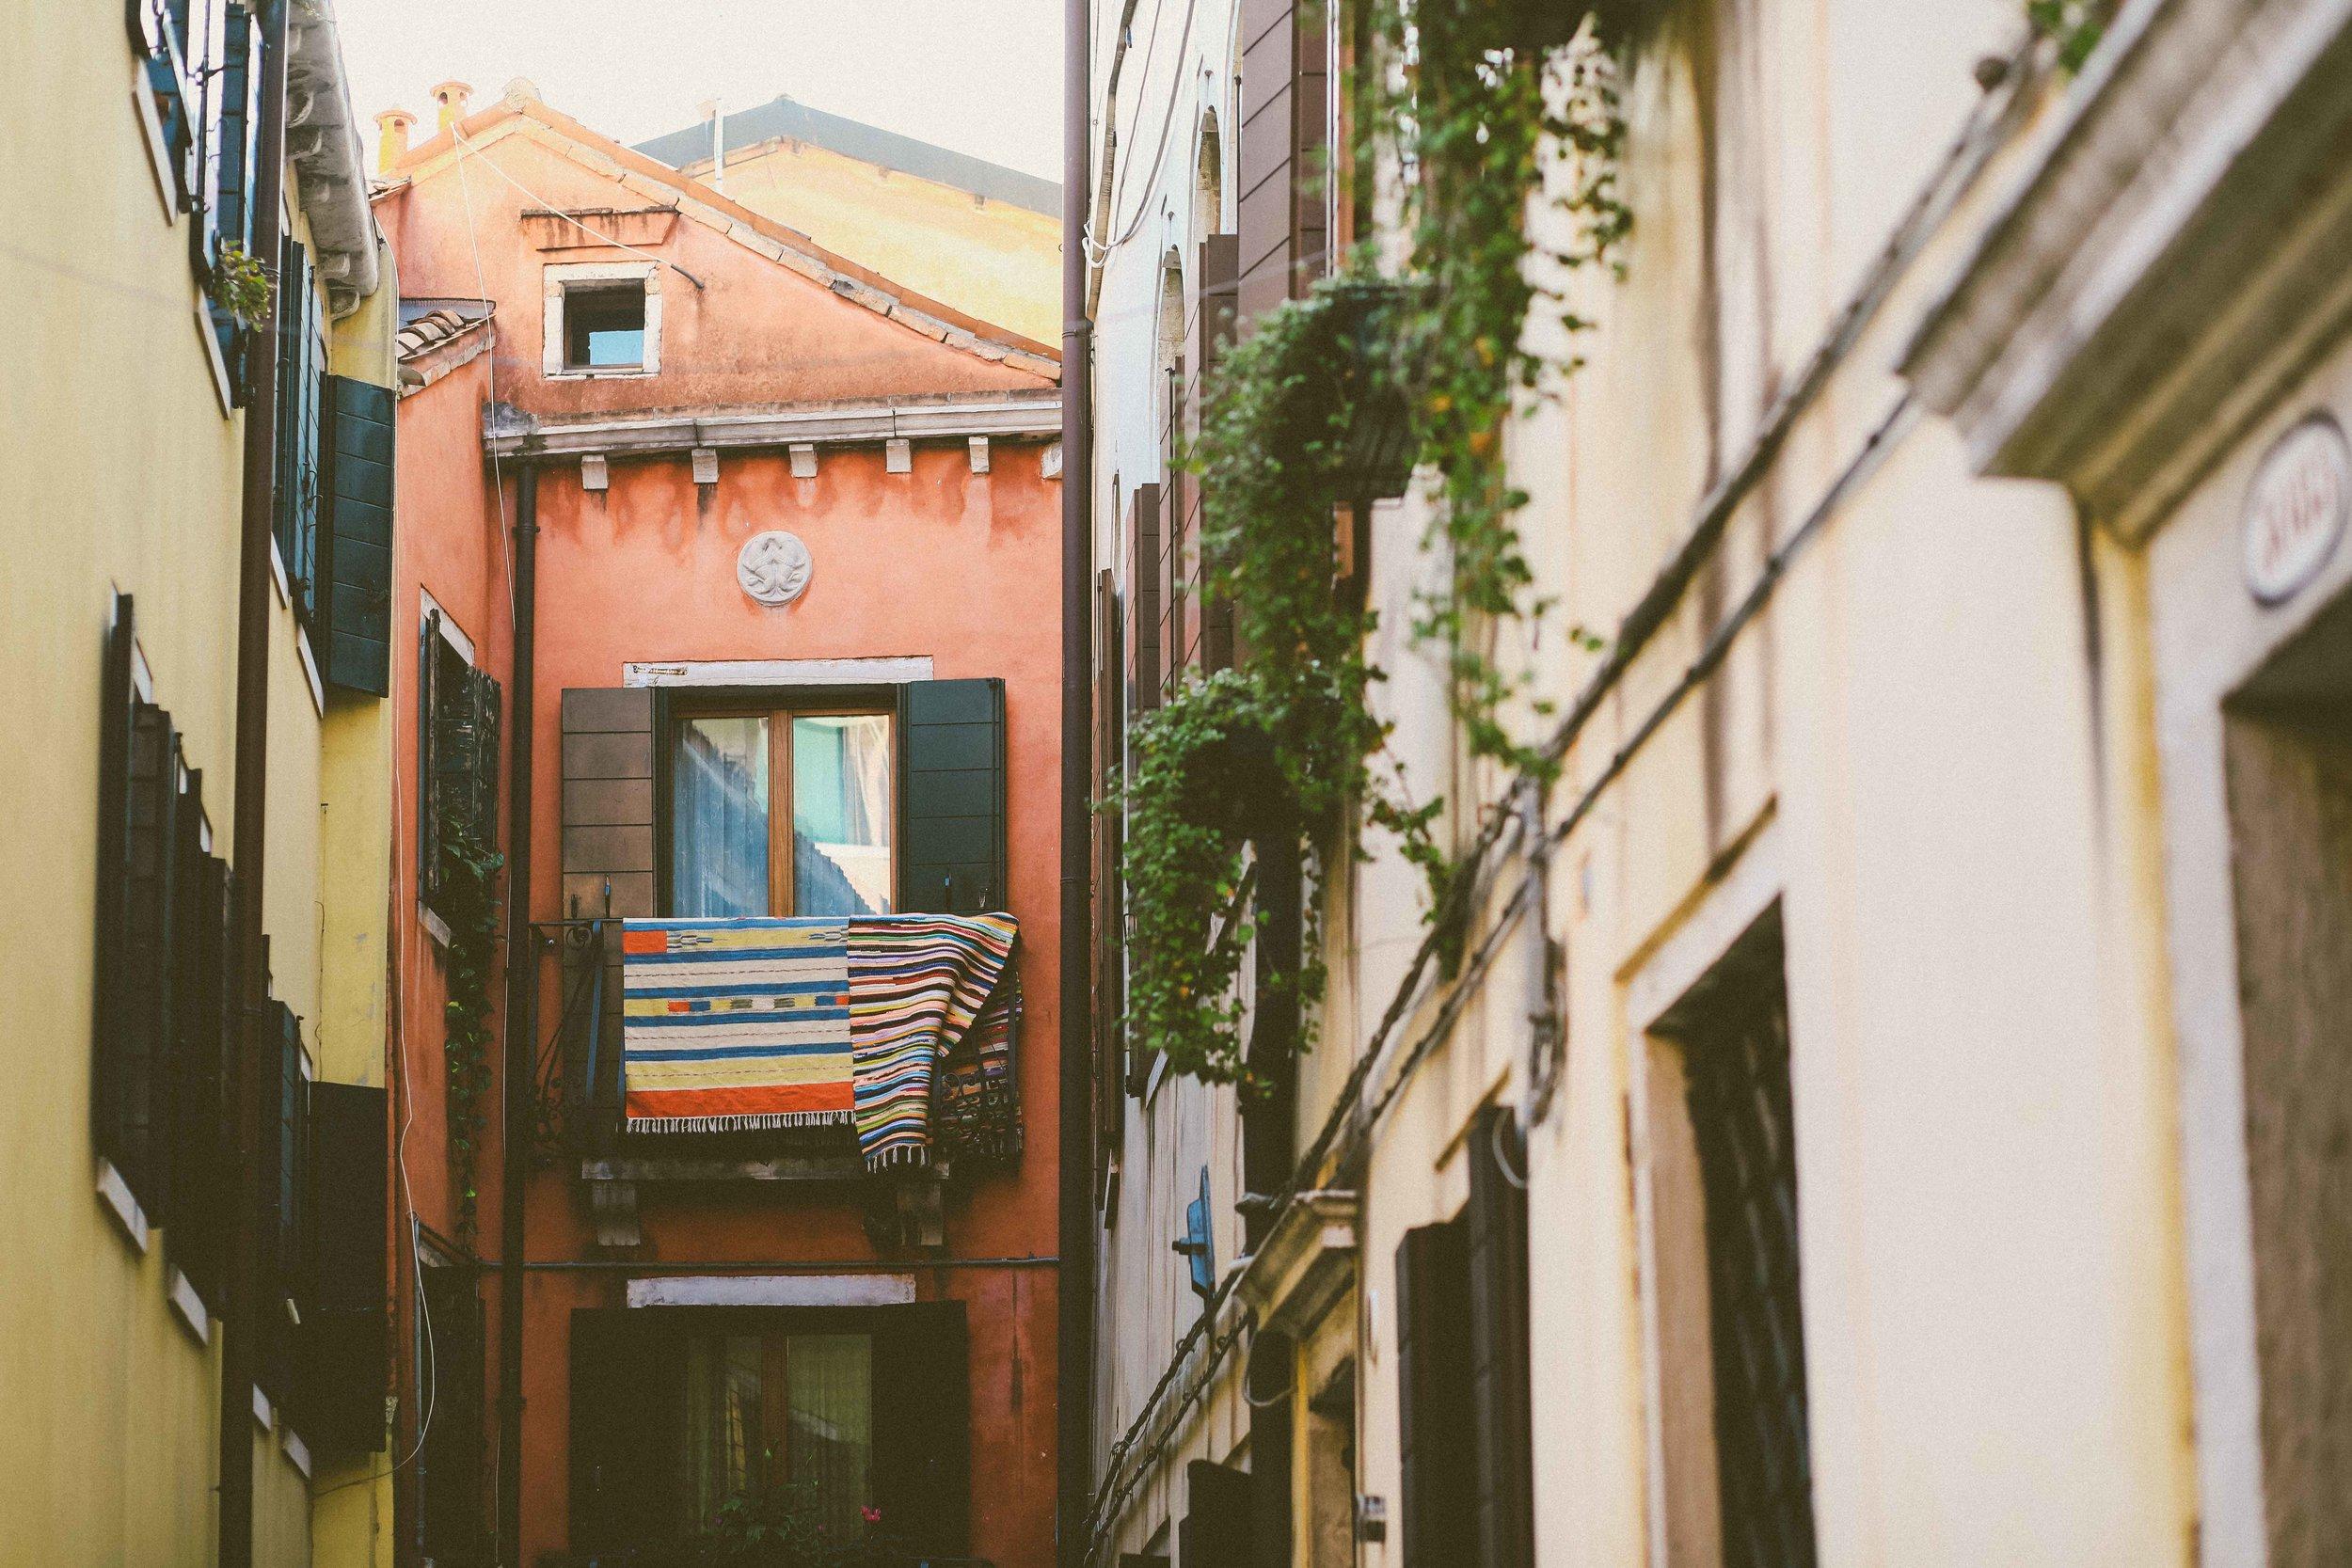 Street_Photographer_Venice_Italy_10.jpg